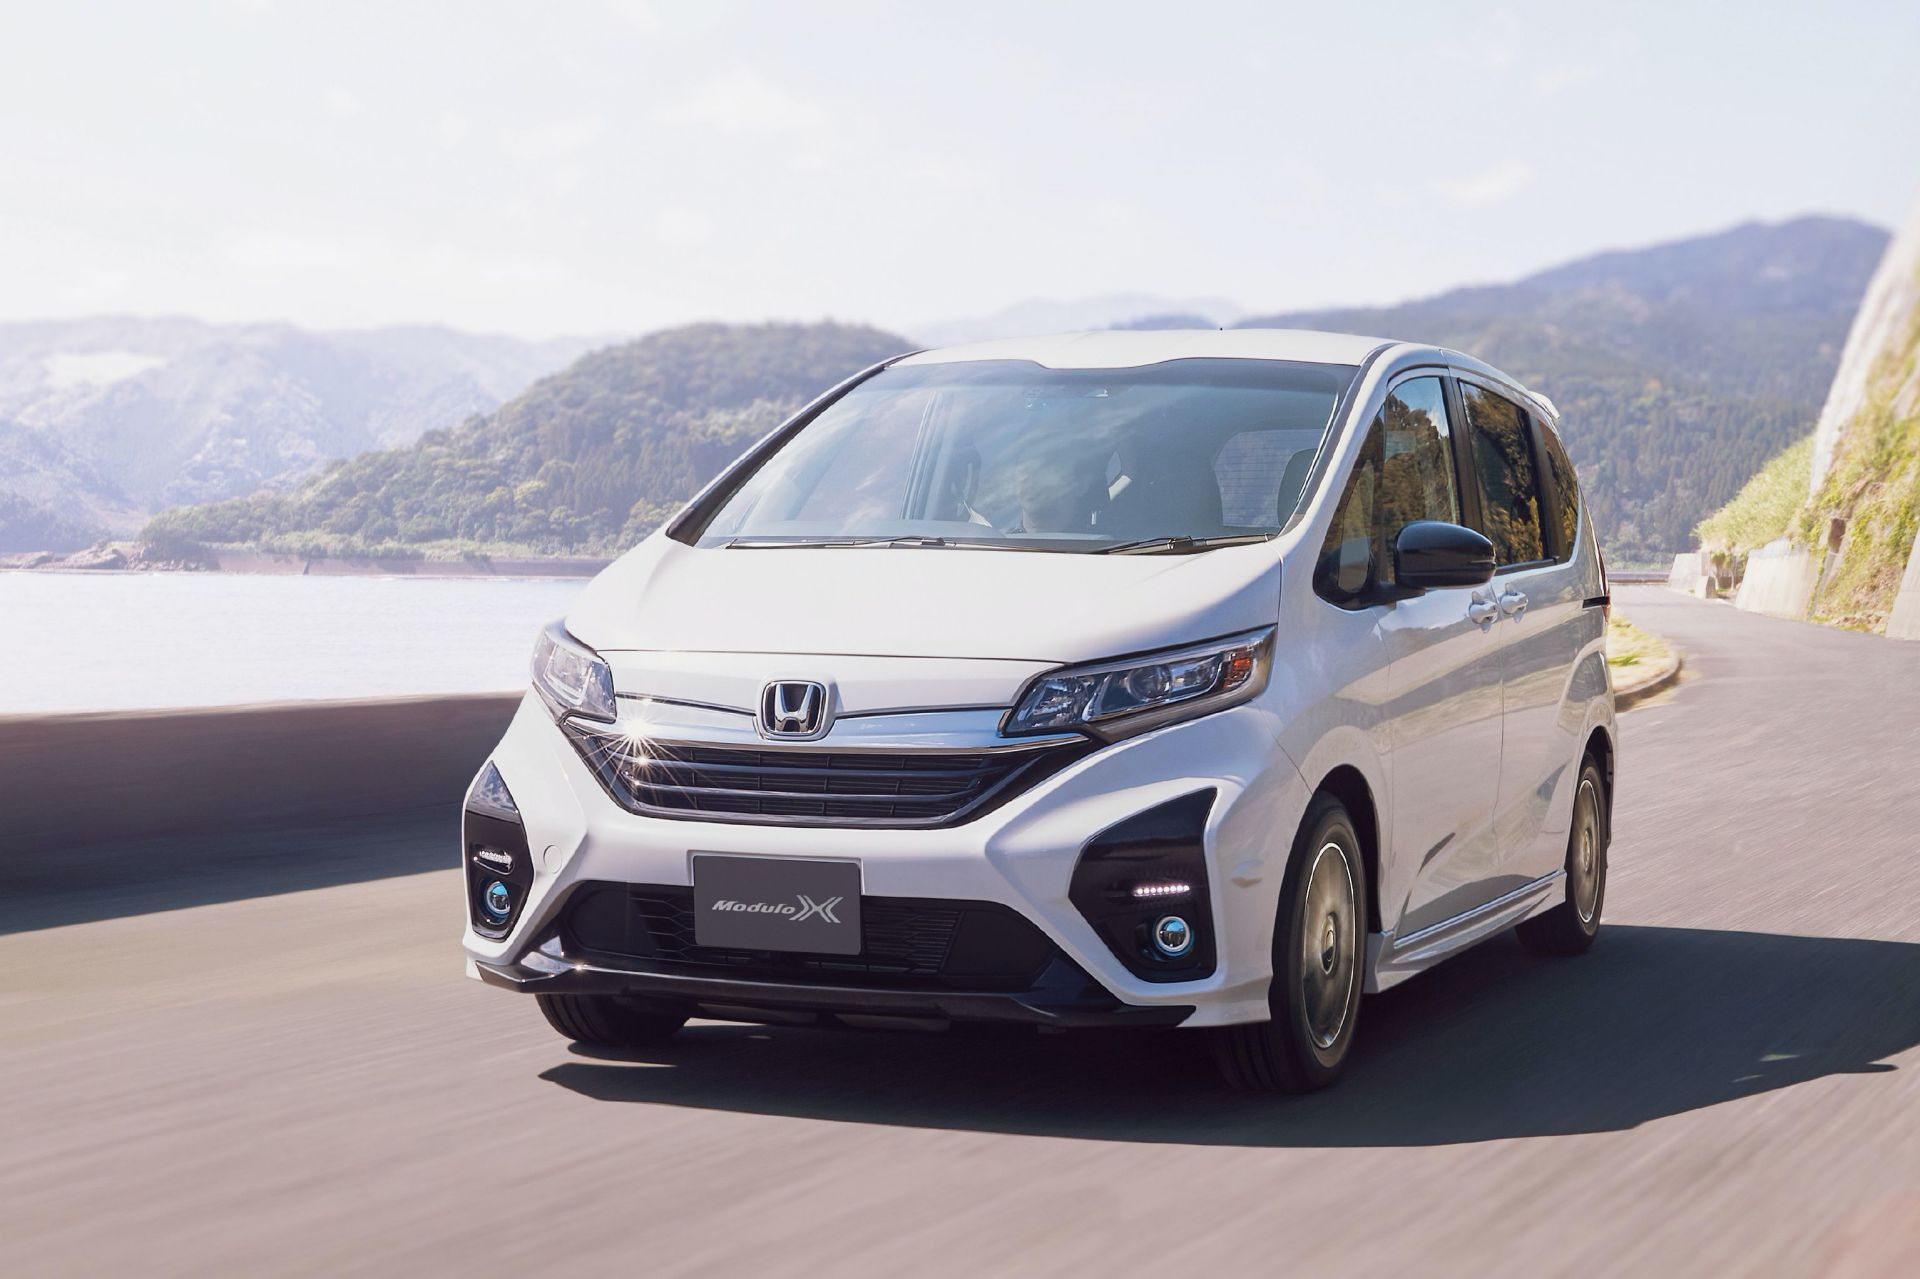 Honda-Freed-Modulo-X-Facelift-2020-36